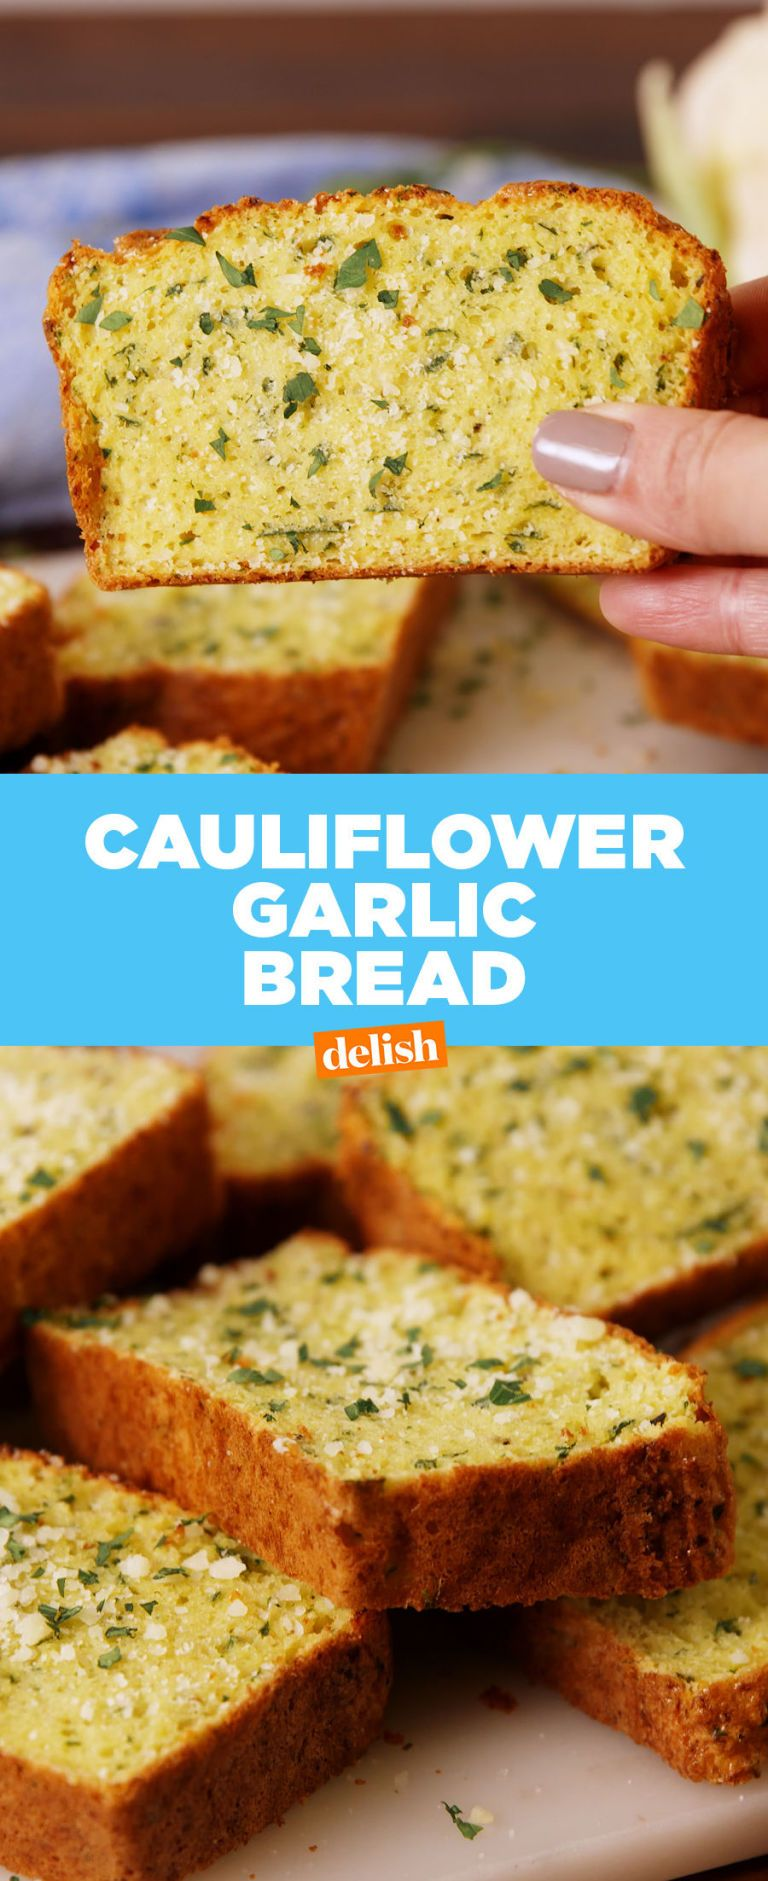 Cauliflower Recipes Casserole Dinners